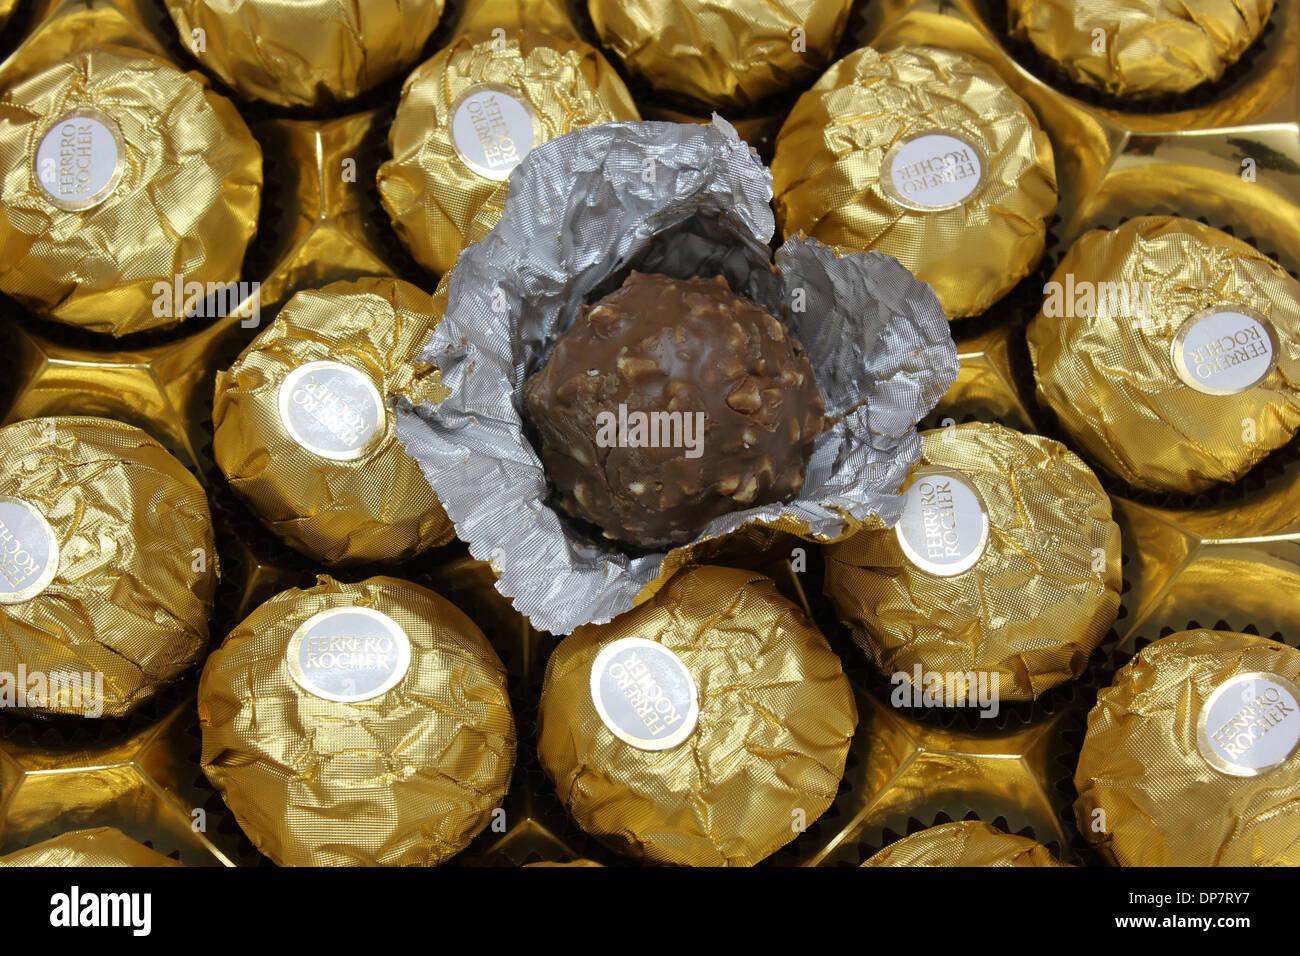 Ferrero Rocher Chocolate Stock Photos & Ferrero Rocher Chocolate ...